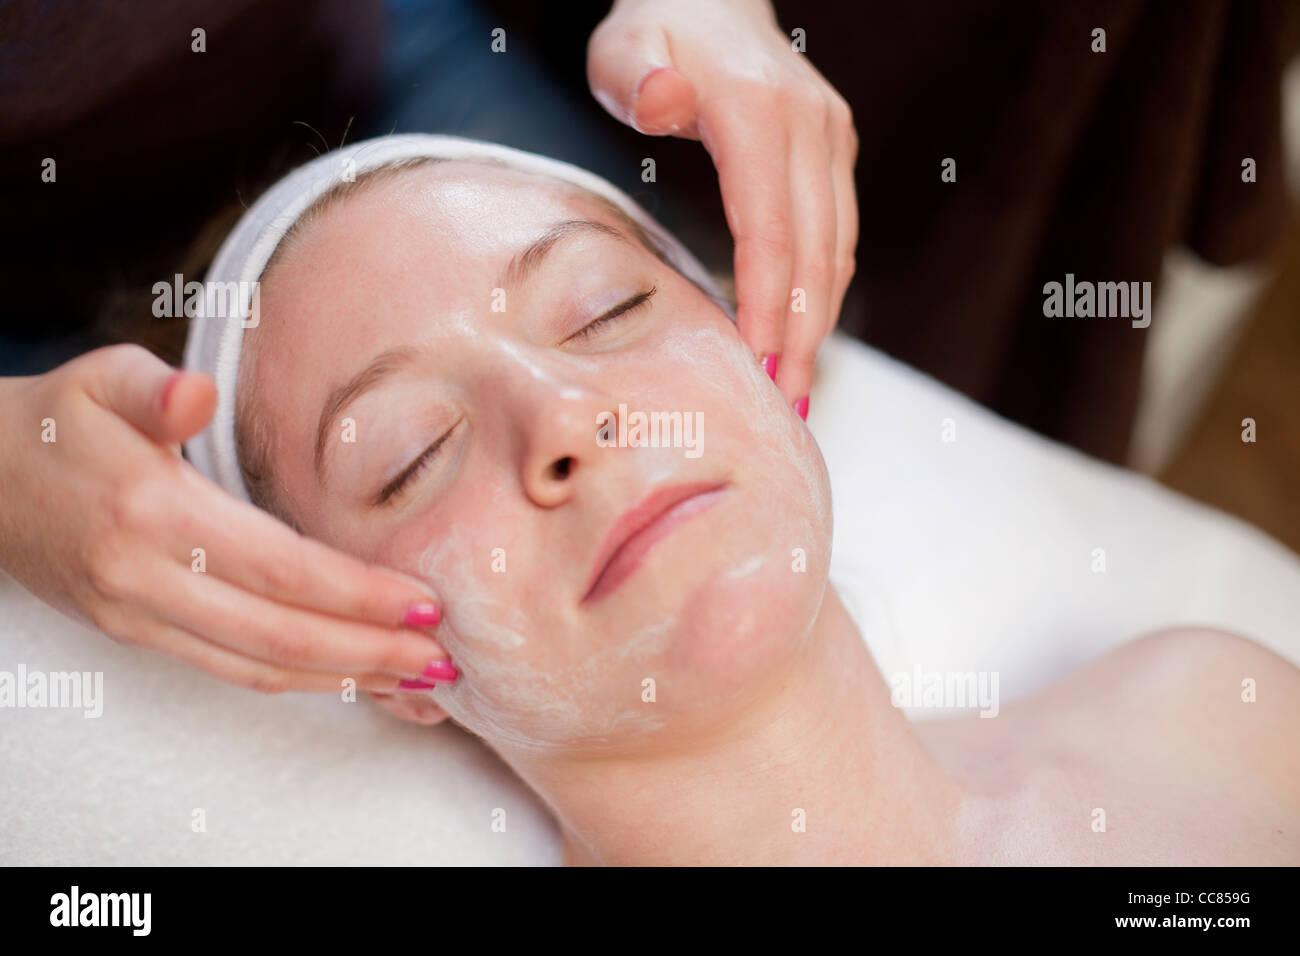 Young woman receiving a facial massage. - Stock Image